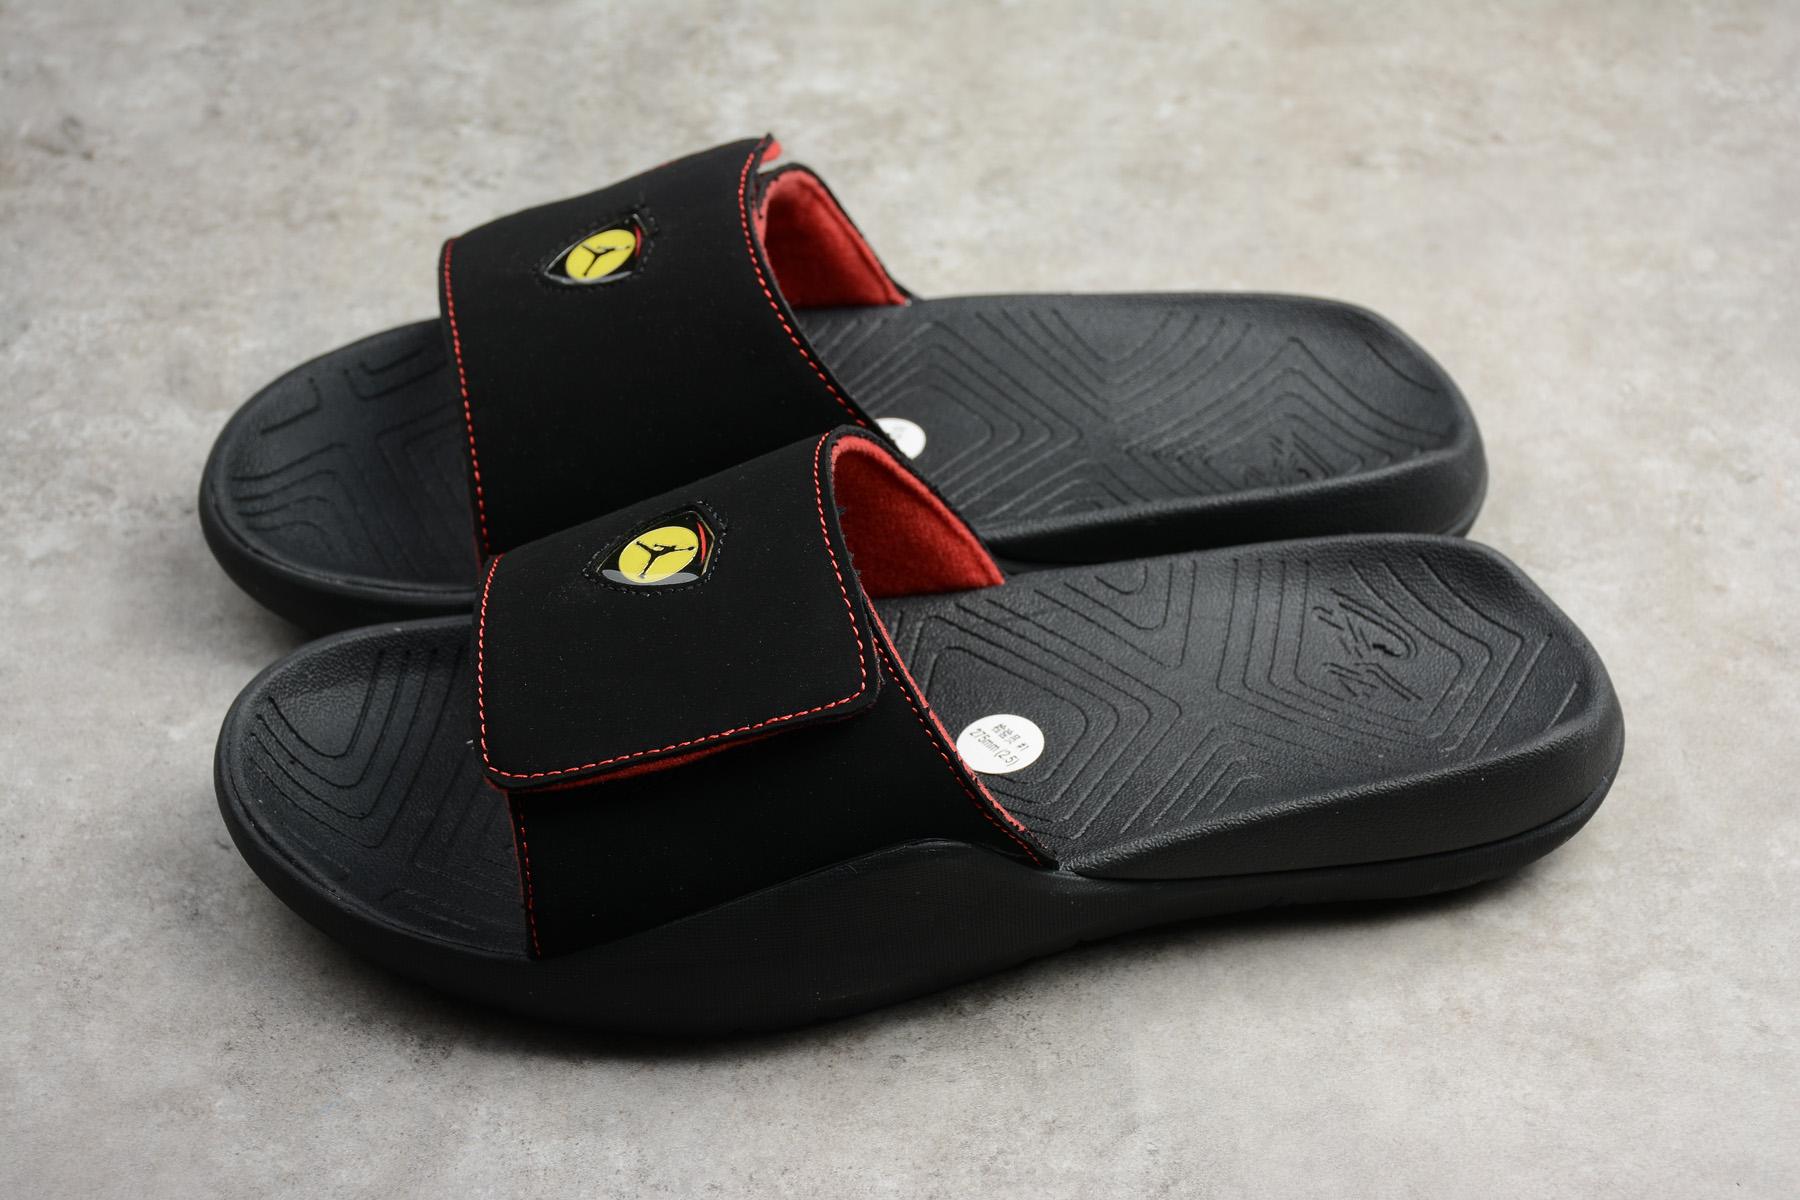 jordan hydro 7 slippers